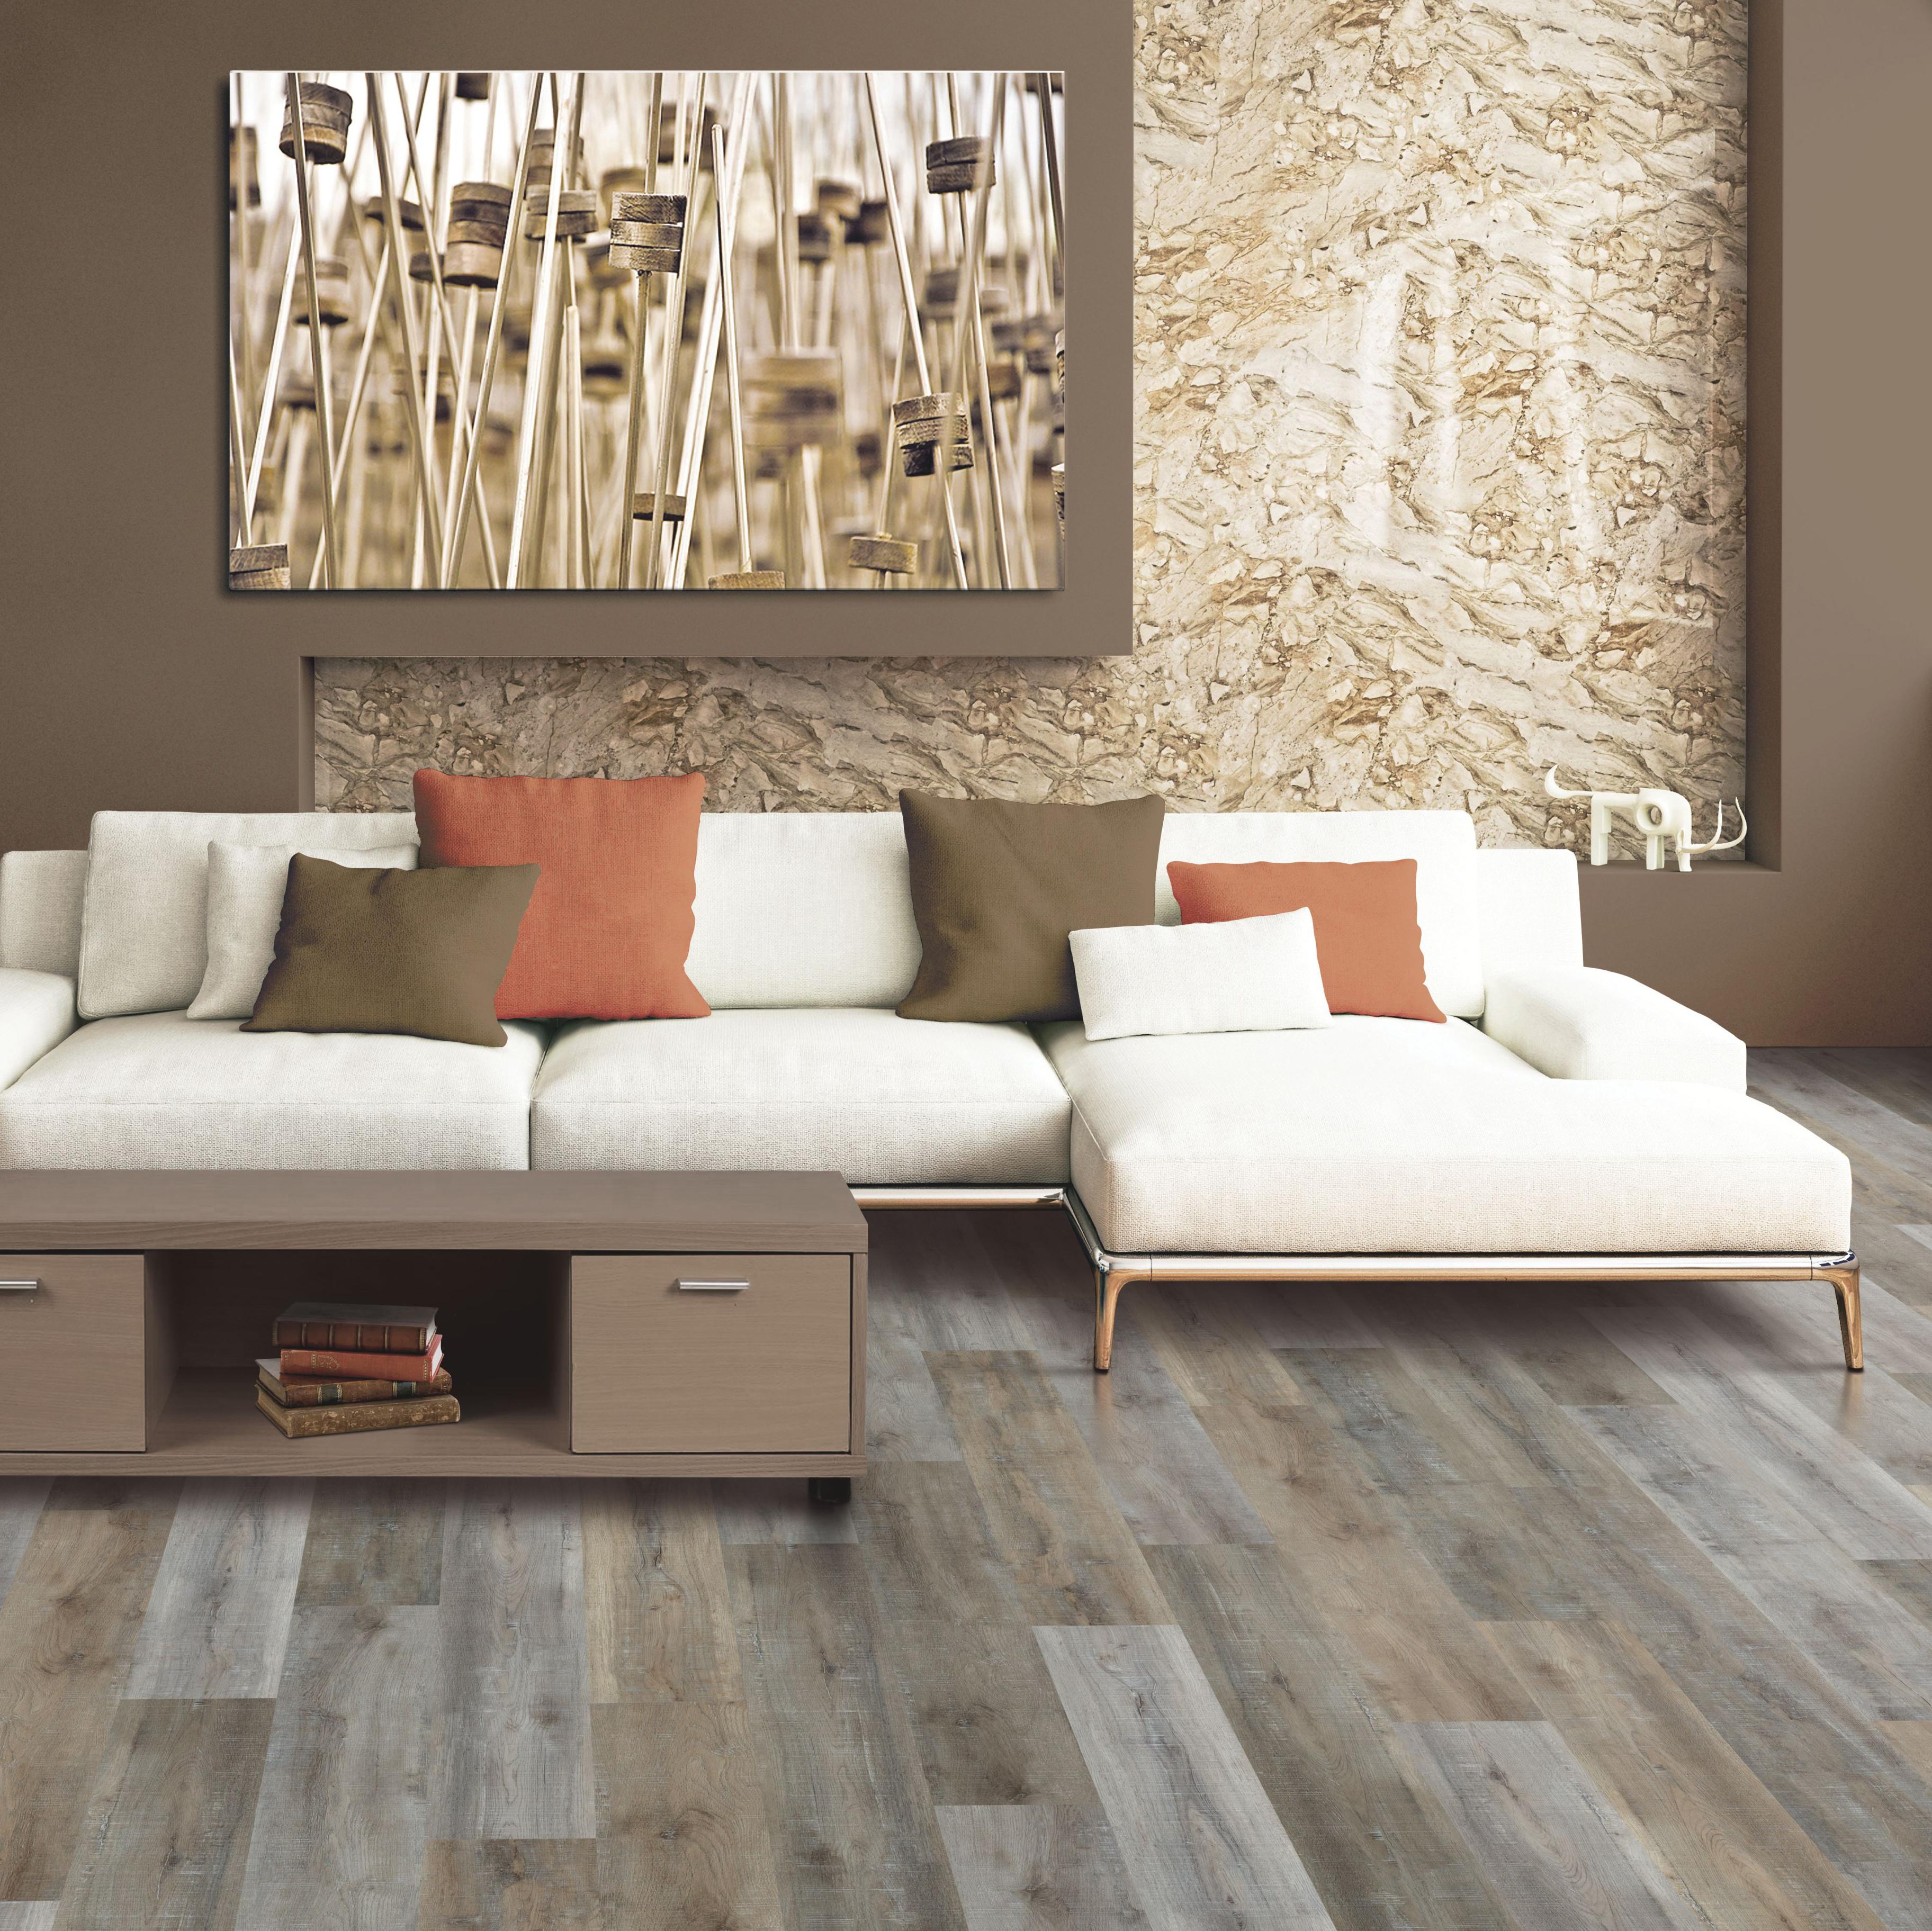 14 Unique Hardwood Floor Refinishing Wilmington Nc 2021 free download hardwood floor refinishing wilmington nc of riterug flooringa carpet hardwood laminate columbus based in style spotlight gray flooring